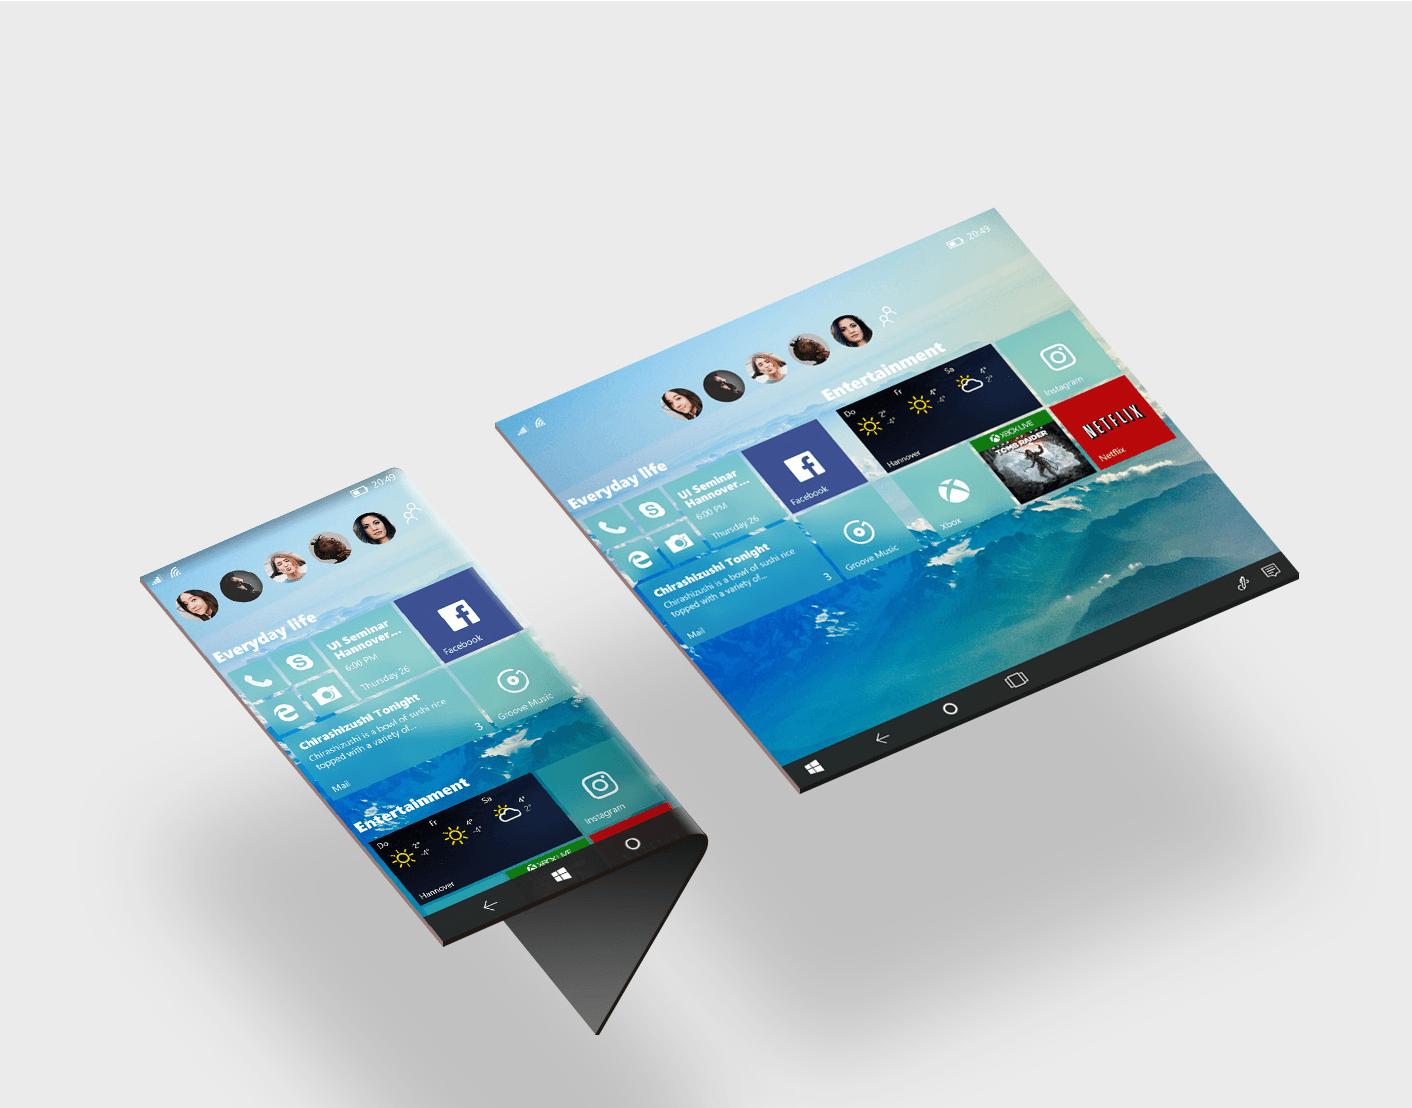 Windows Polaris Could Run Legacy Win32 Apps Through Remote